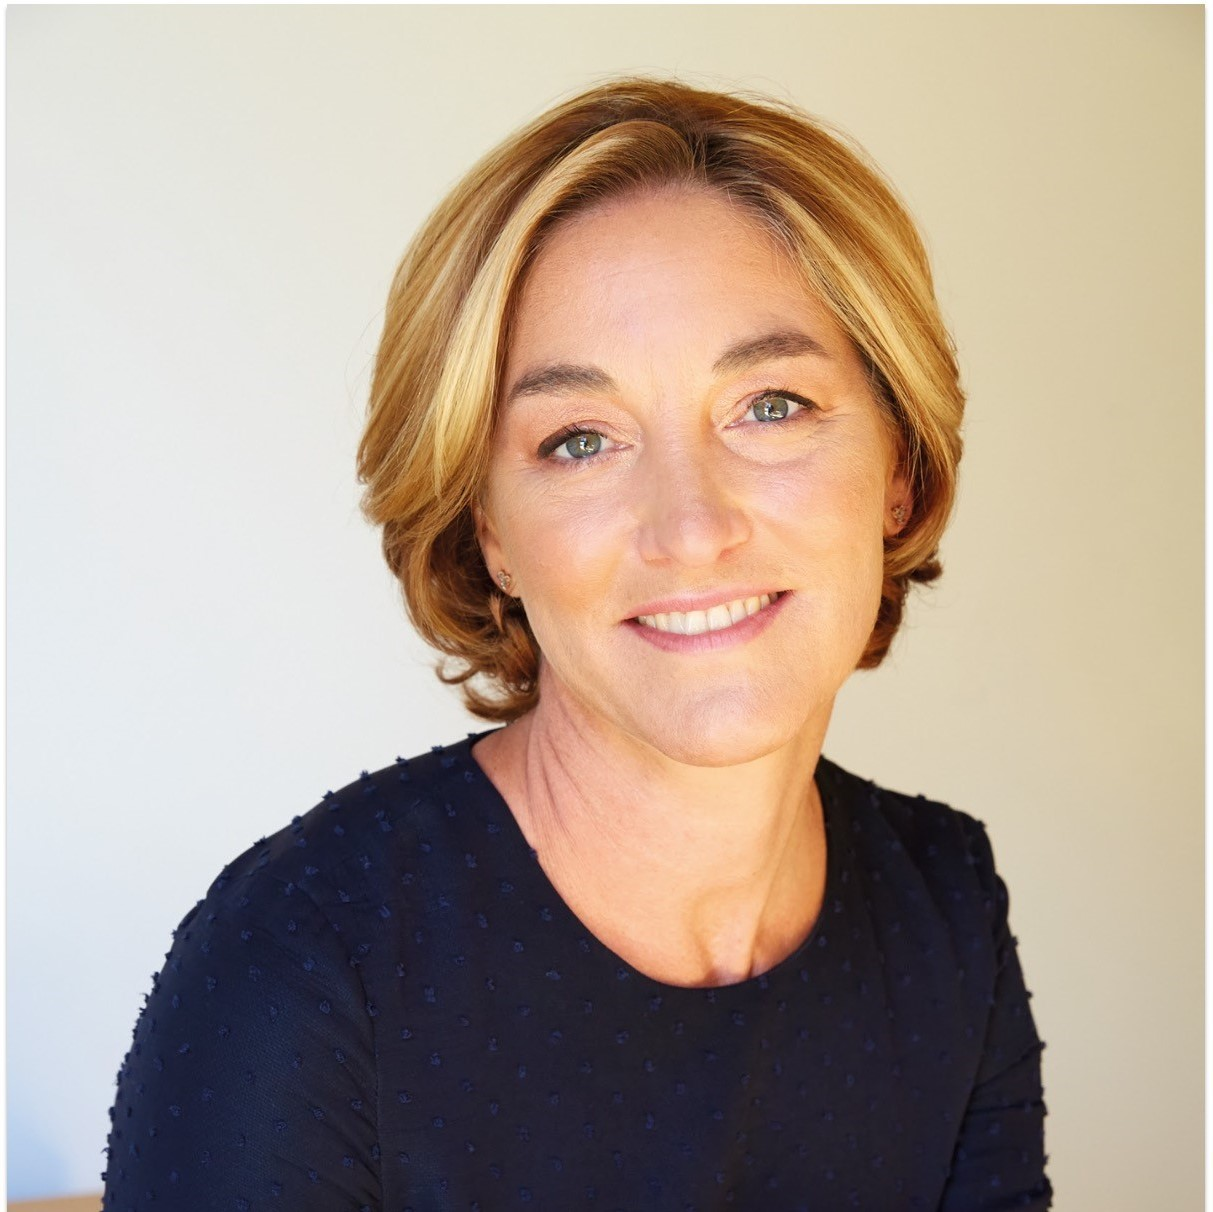 Prof. Sadie Morgan OBE